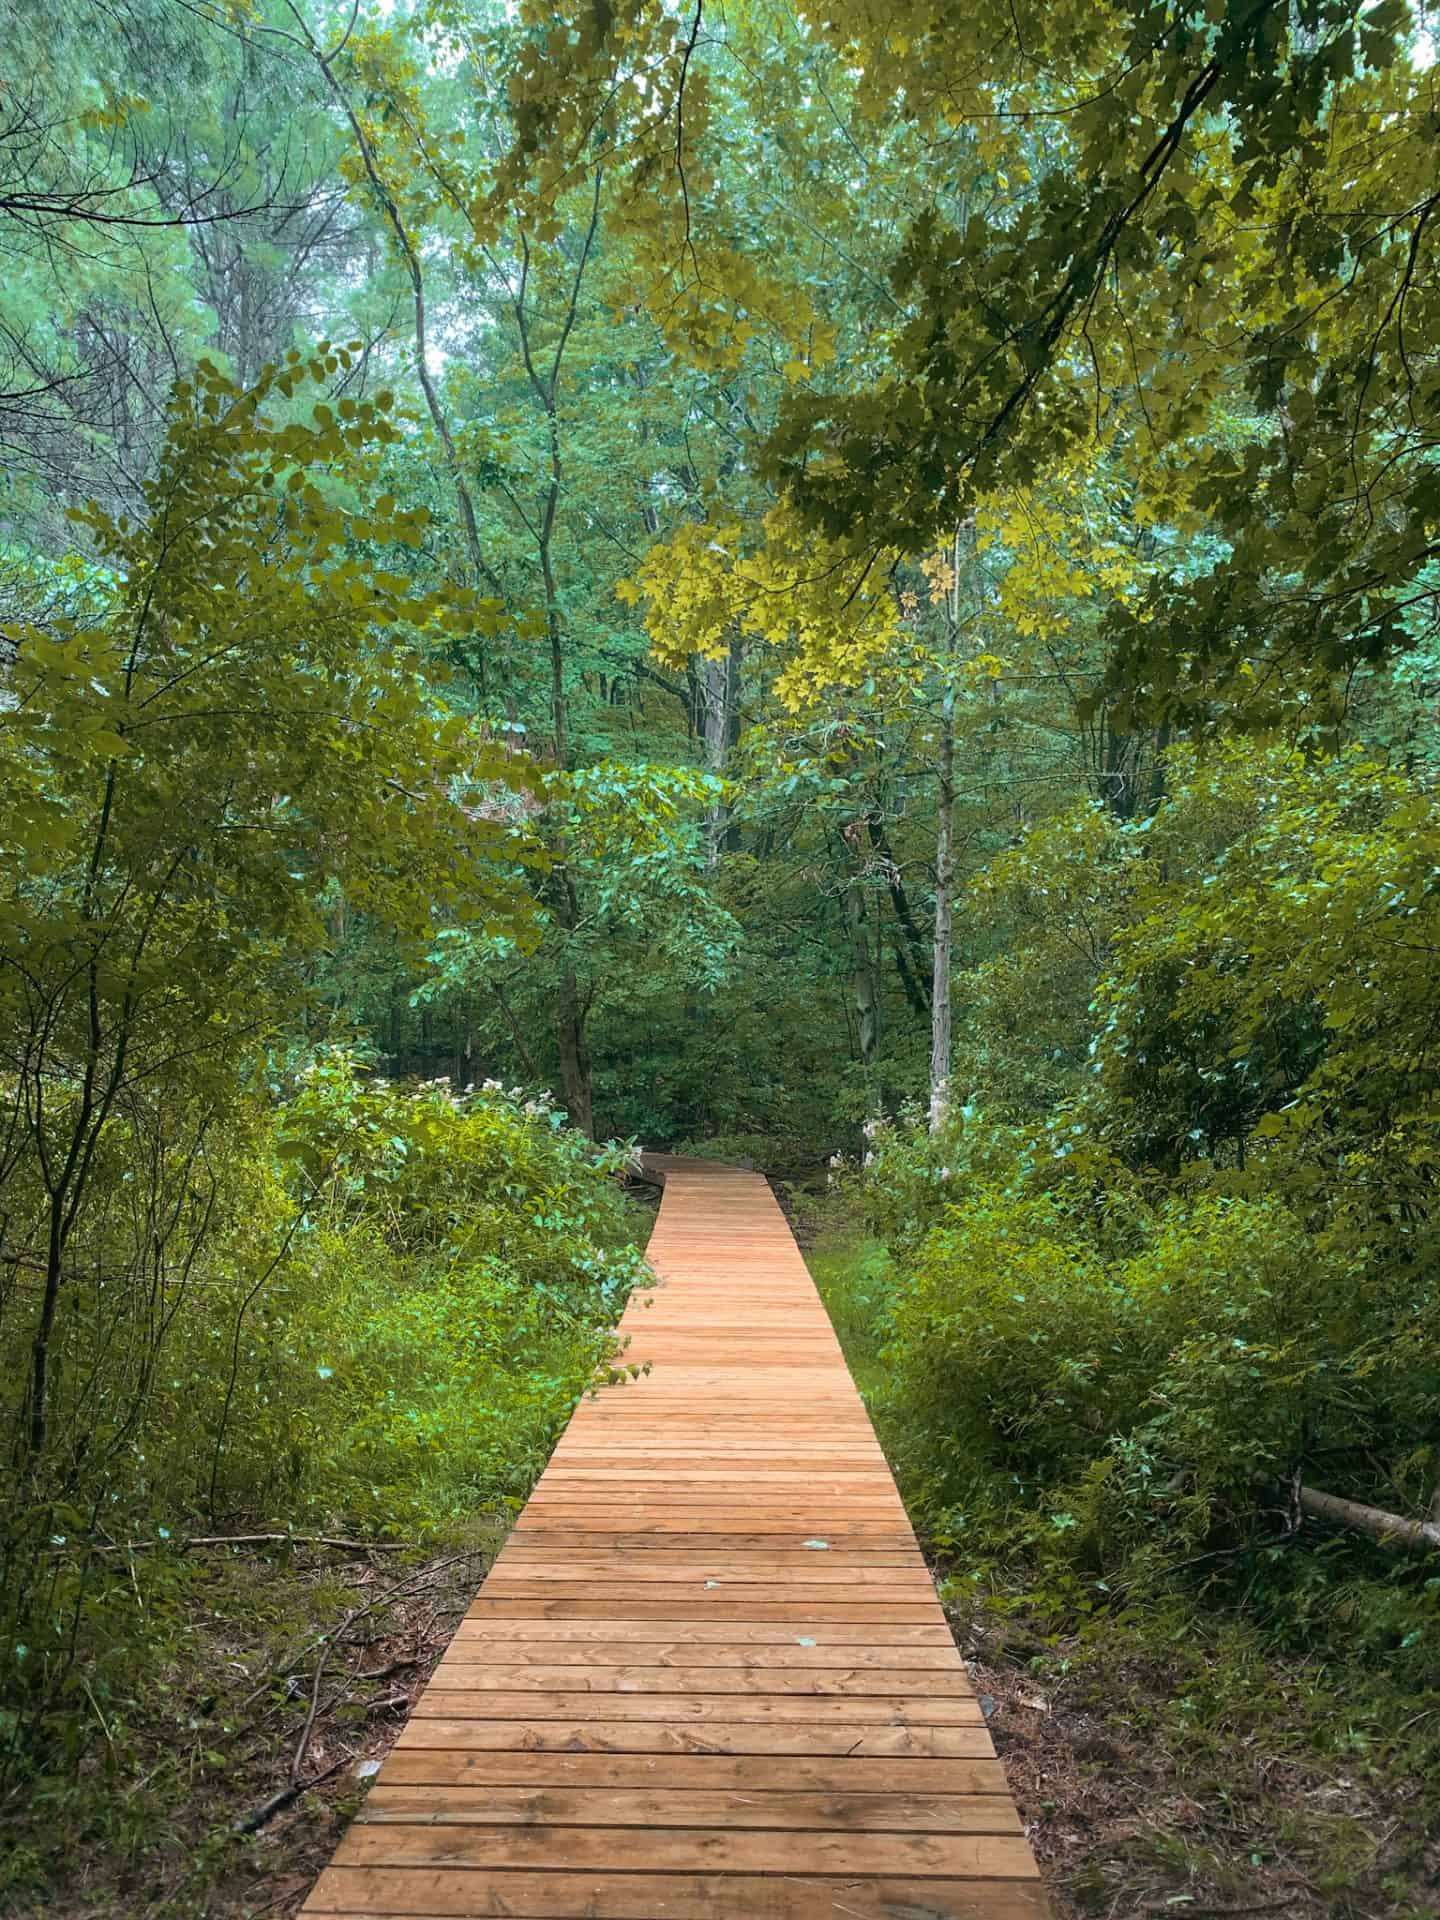 Jones Creek Trails in Gananoque, Ontario